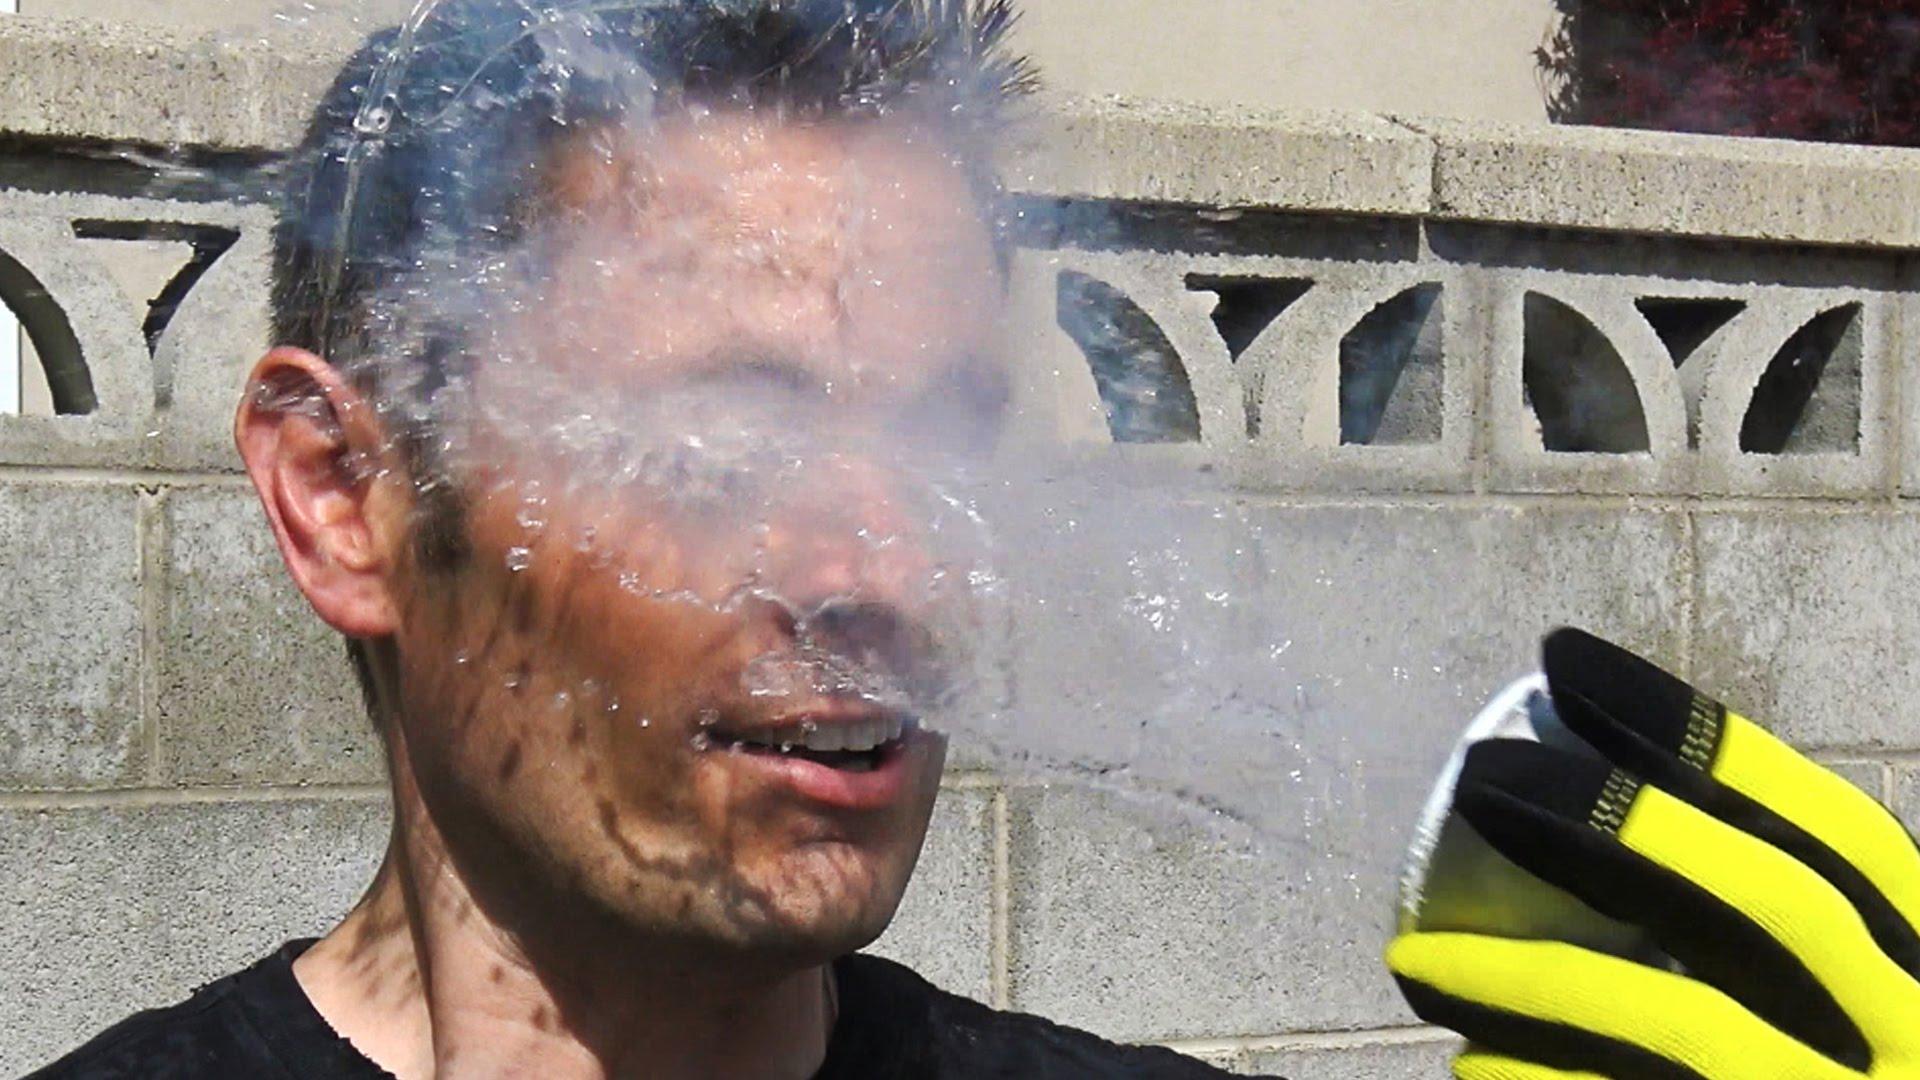 Liquid Nitrogen in the face